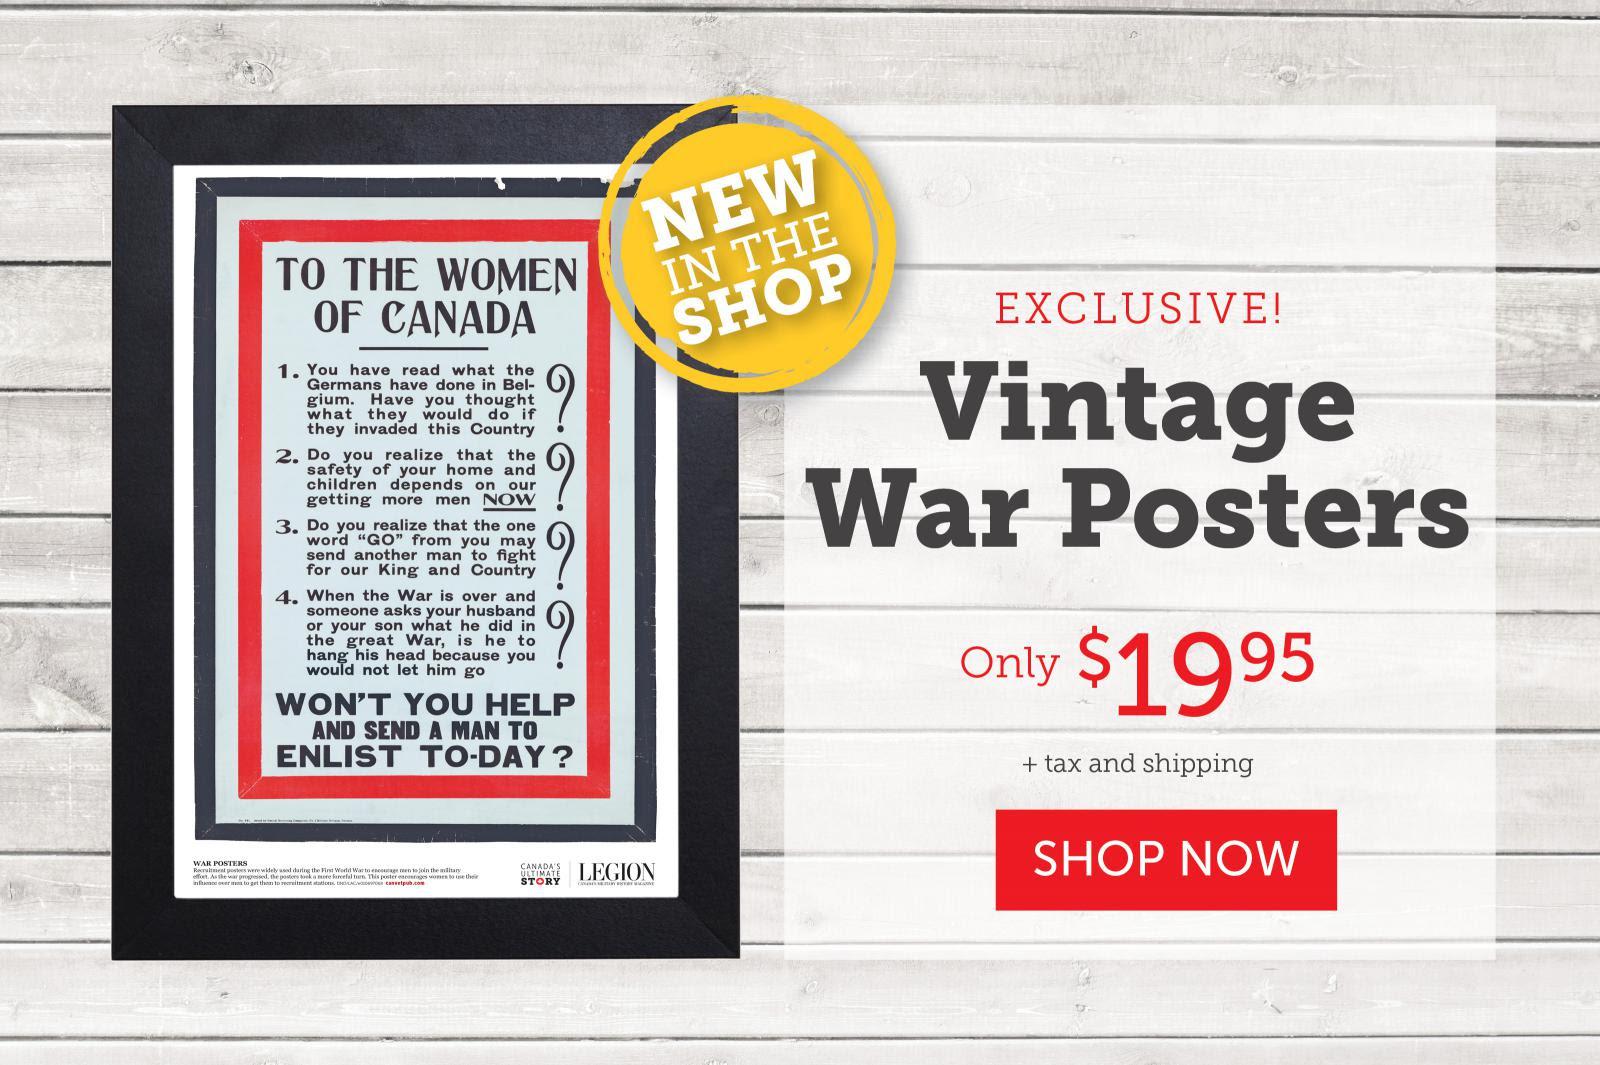 New Vintage War Posters!